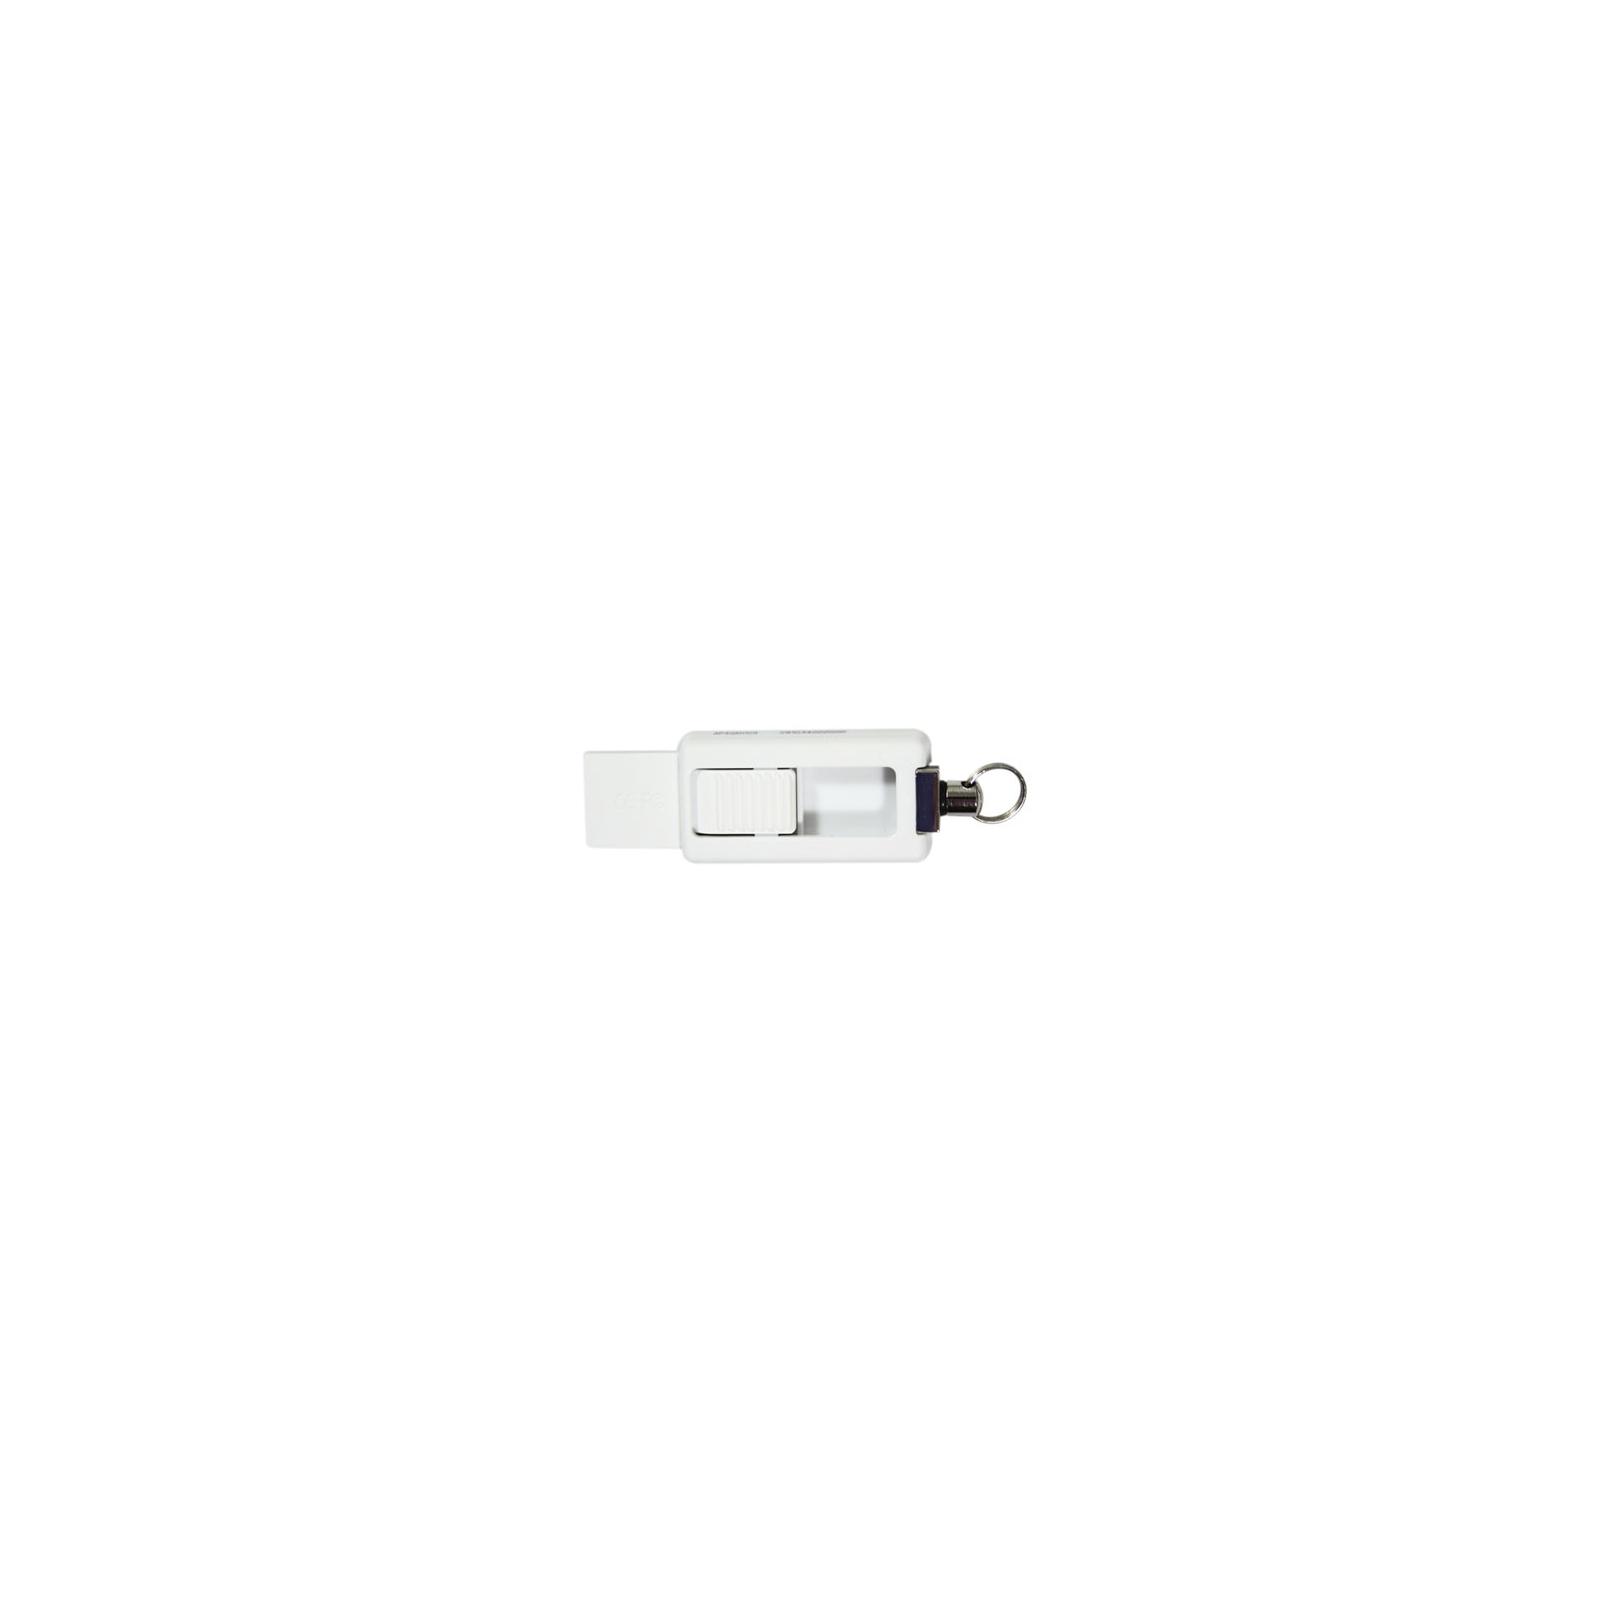 USB флеш накопитель 16GB AH129 Pink RP USB2.0 Apacer (AP16GAH129P-1) изображение 3